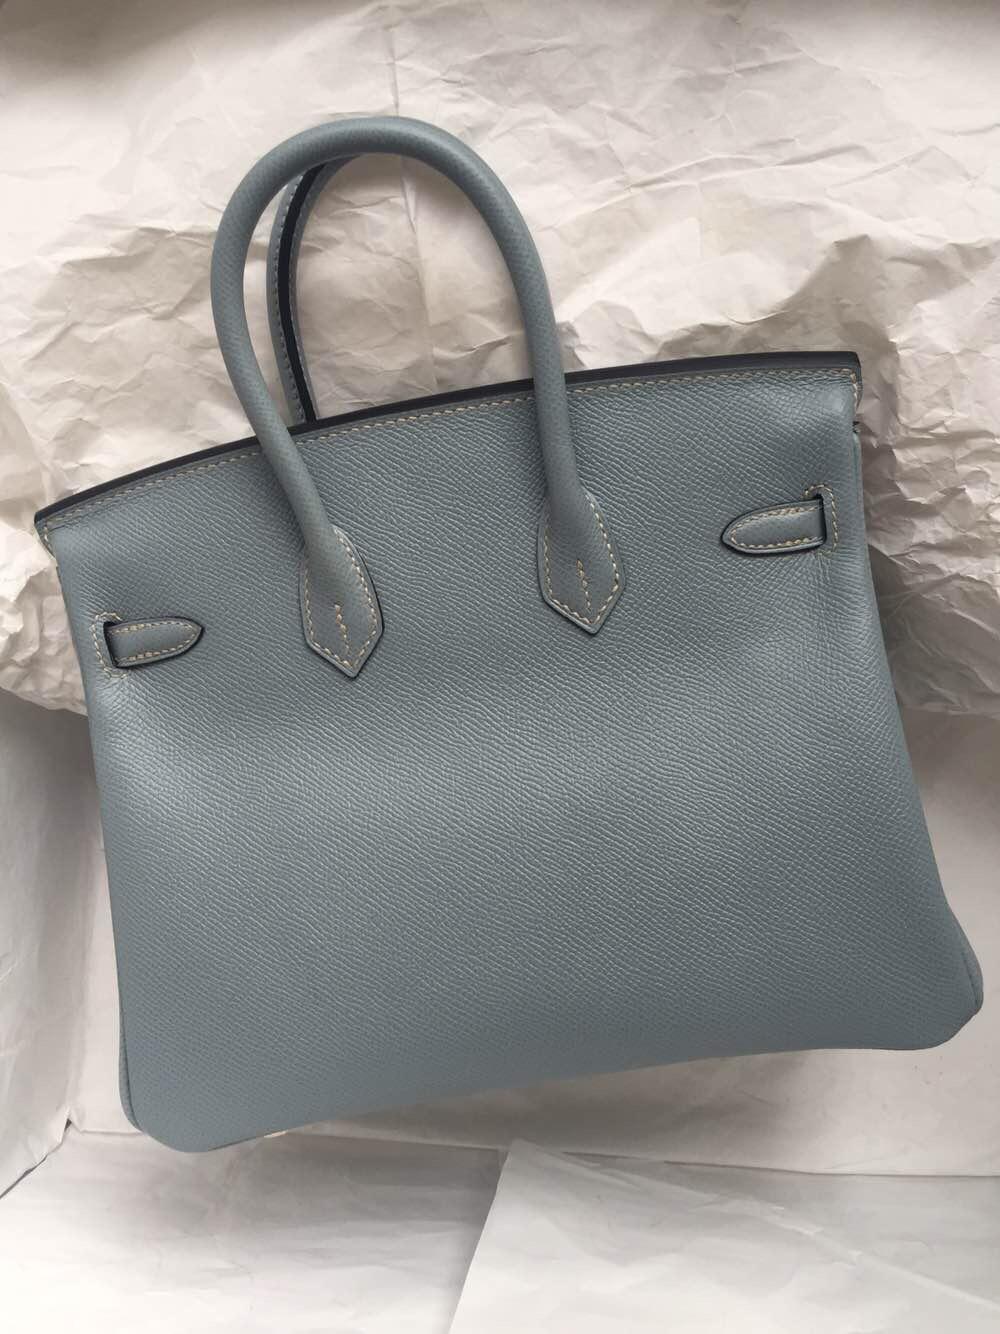 Sale Hermes Birkin25cm J7 Blue Lin Epsom Leather Women's Tote Bag